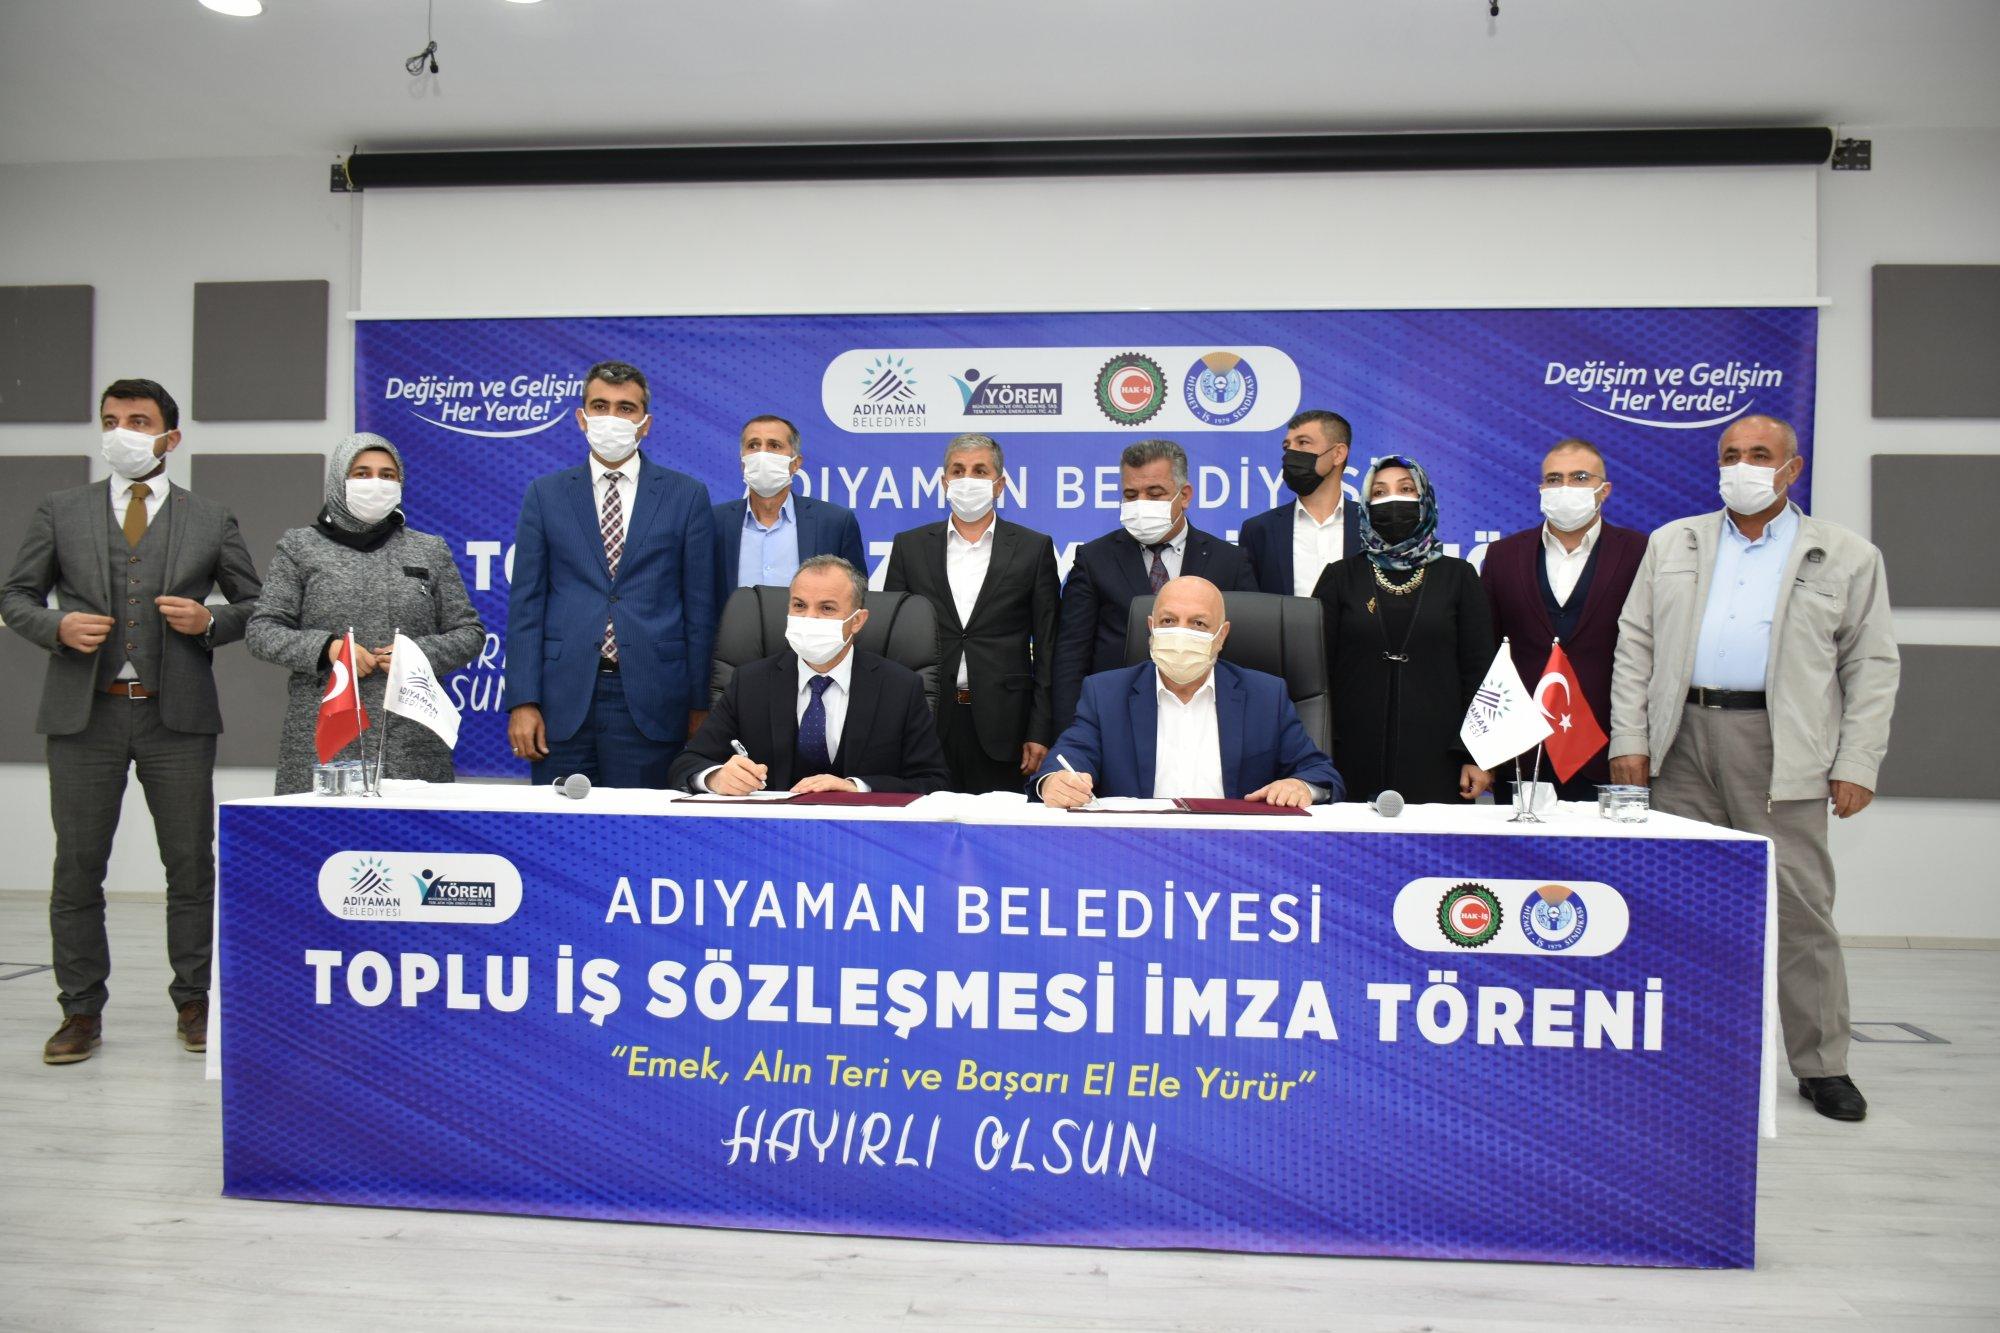 ARSLAN, ADIYAMAN'DA TİS TÖRENİNE KATILDI